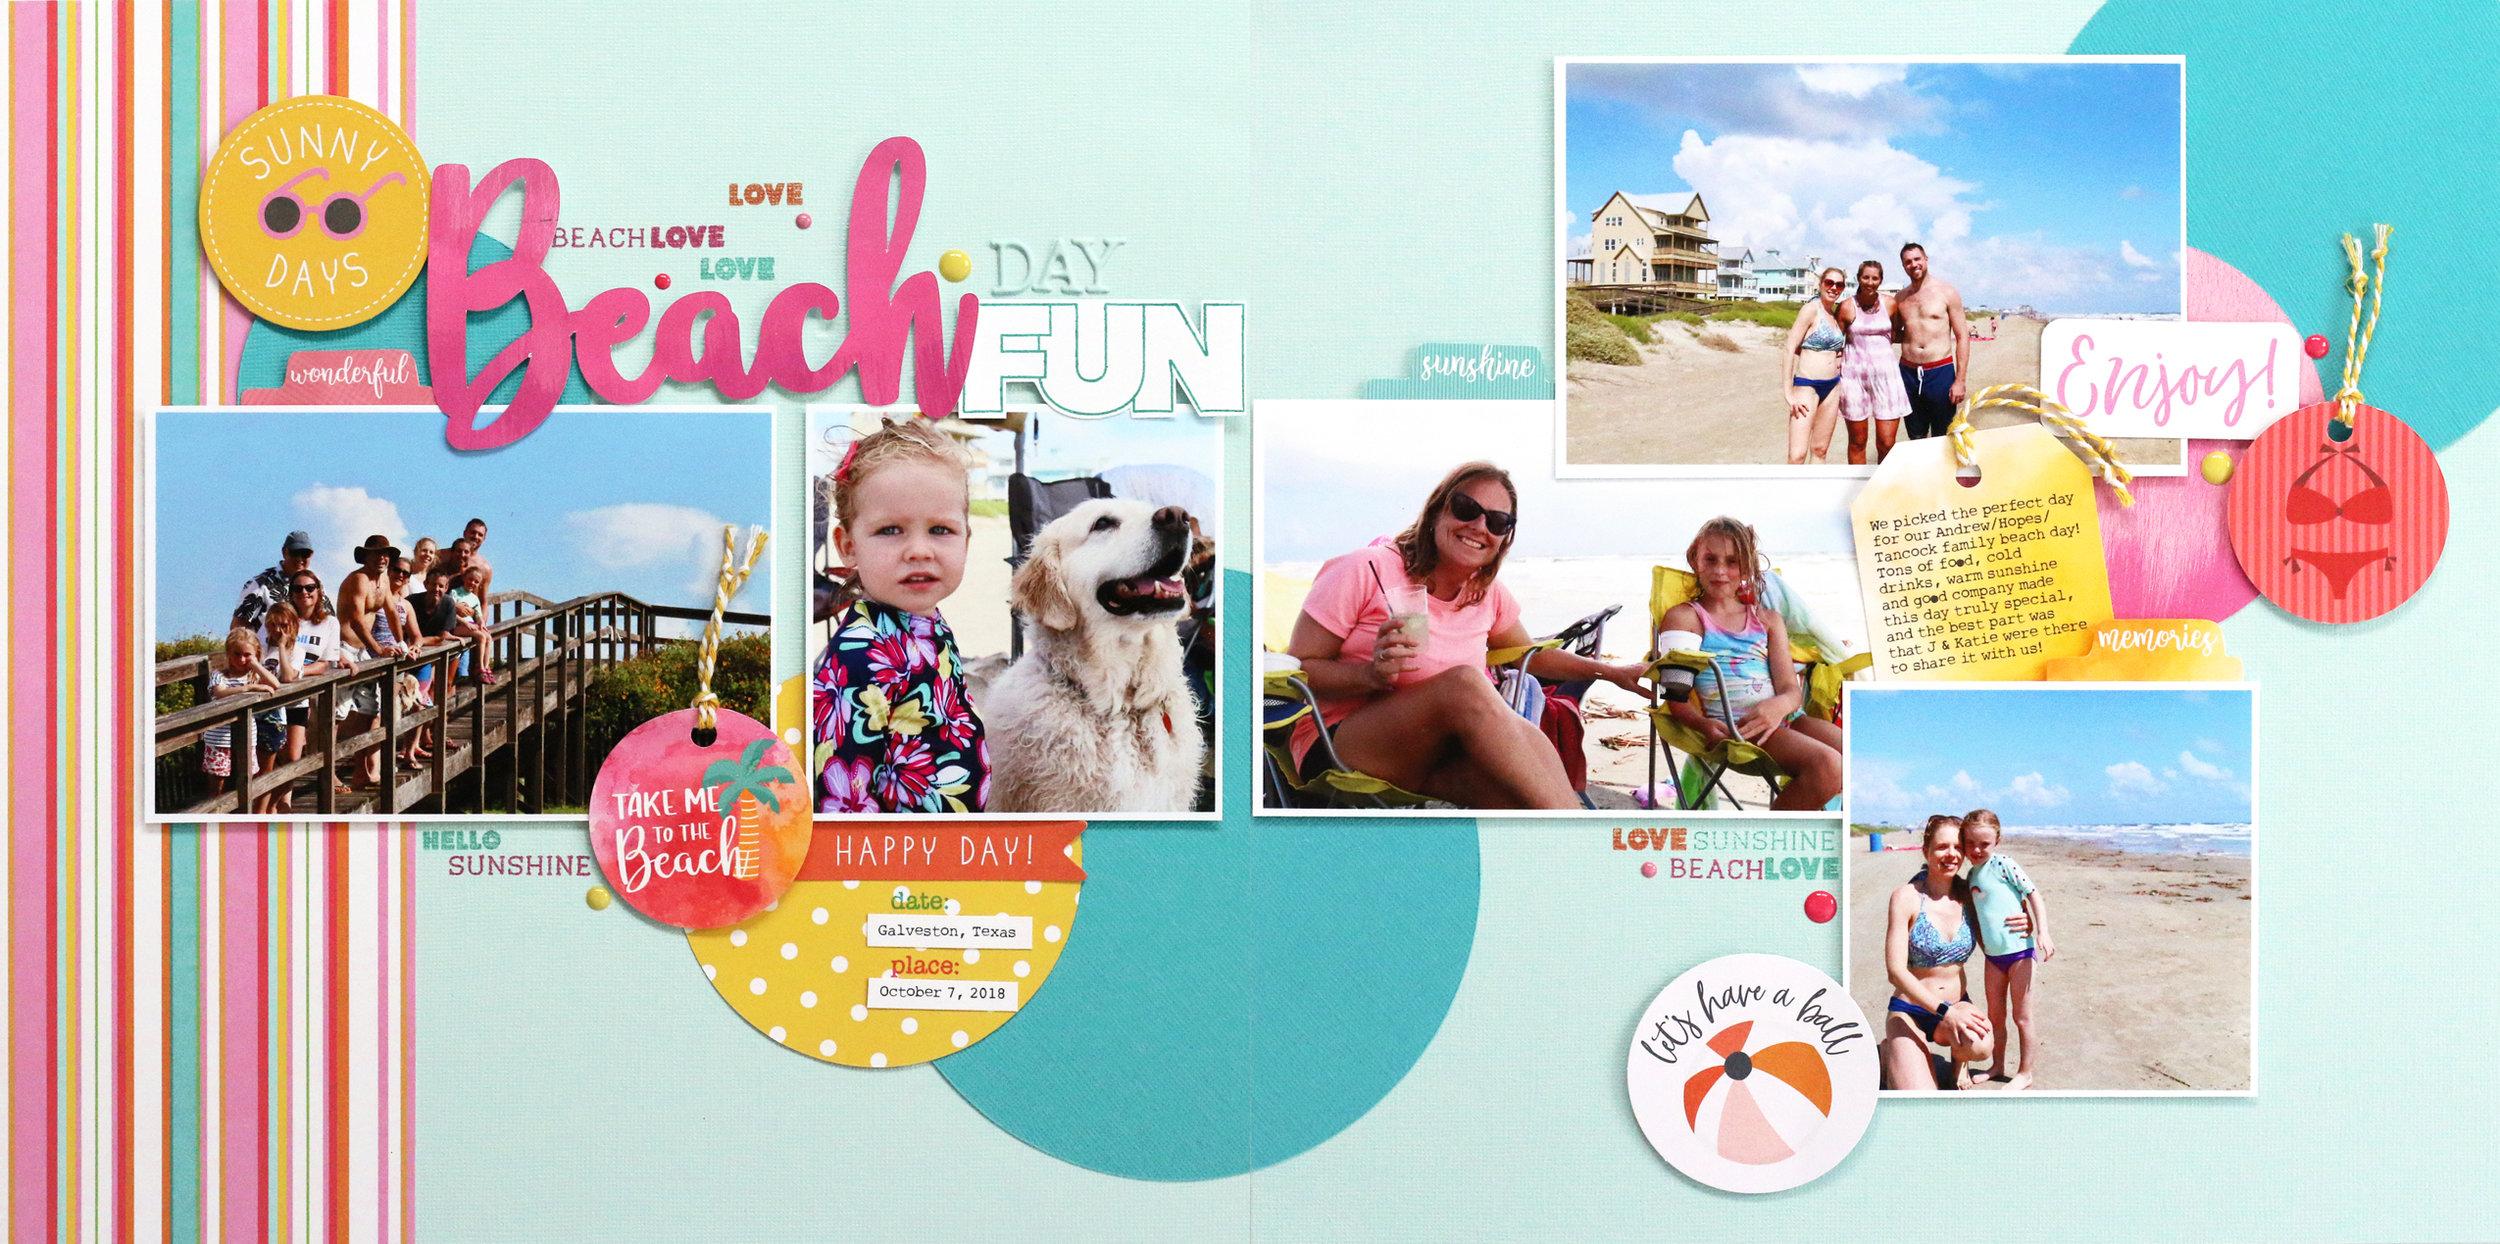 SCTMagazine_MeghannAndrew_BeachDayFun_01.jpg